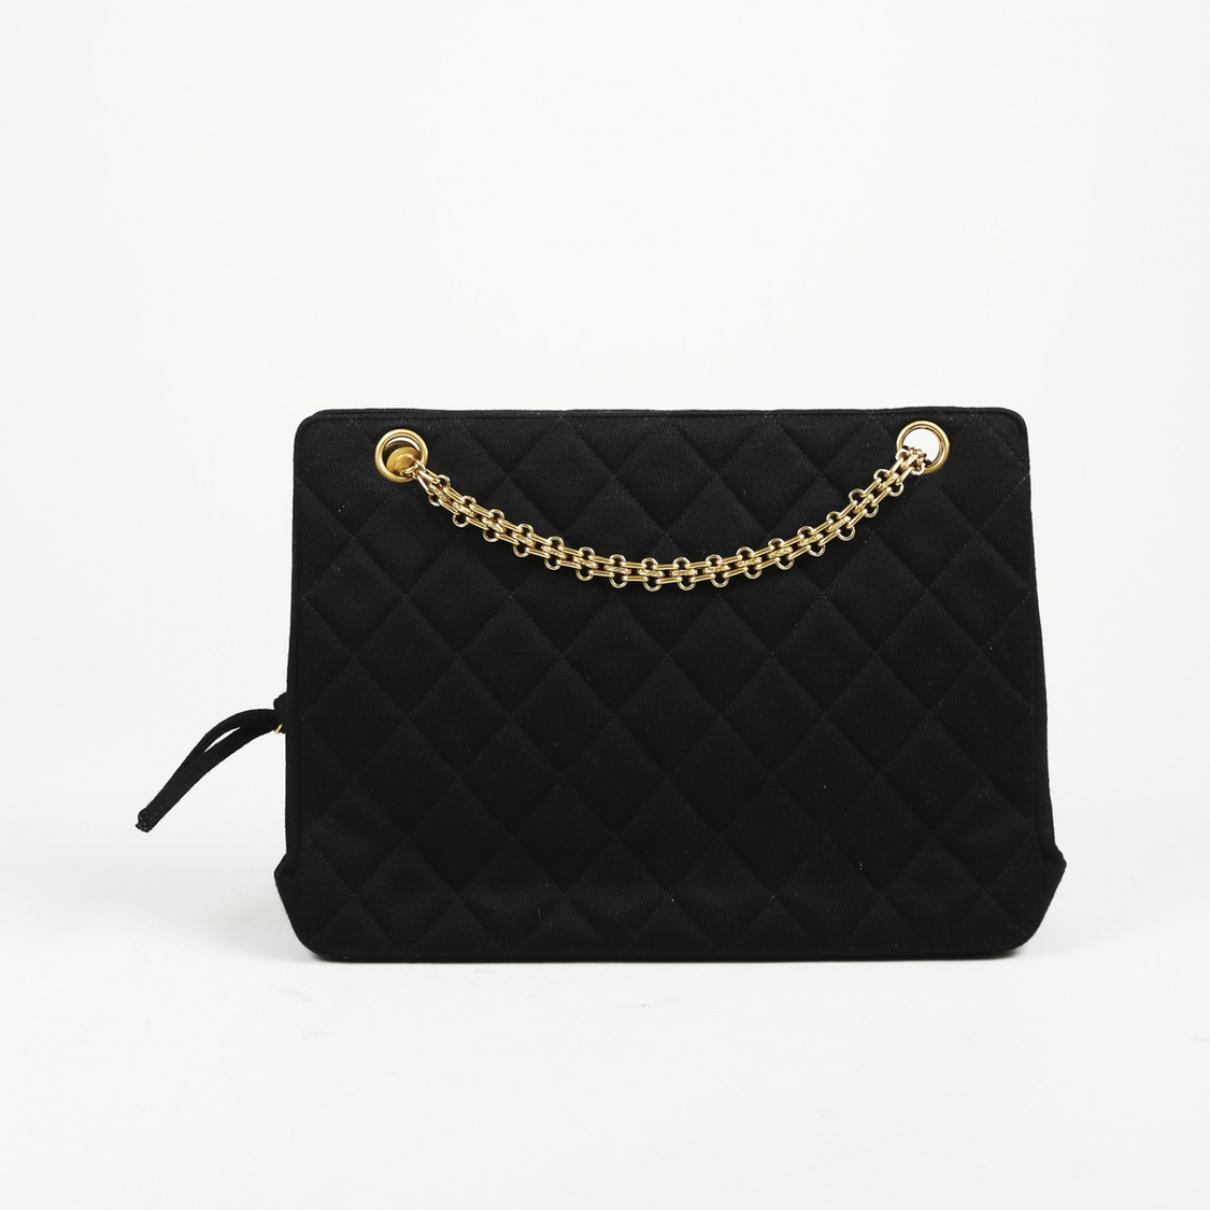 97ee917ac573 Chanel Pre-owned Vintage Black Cloth Handbags in Black - Lyst